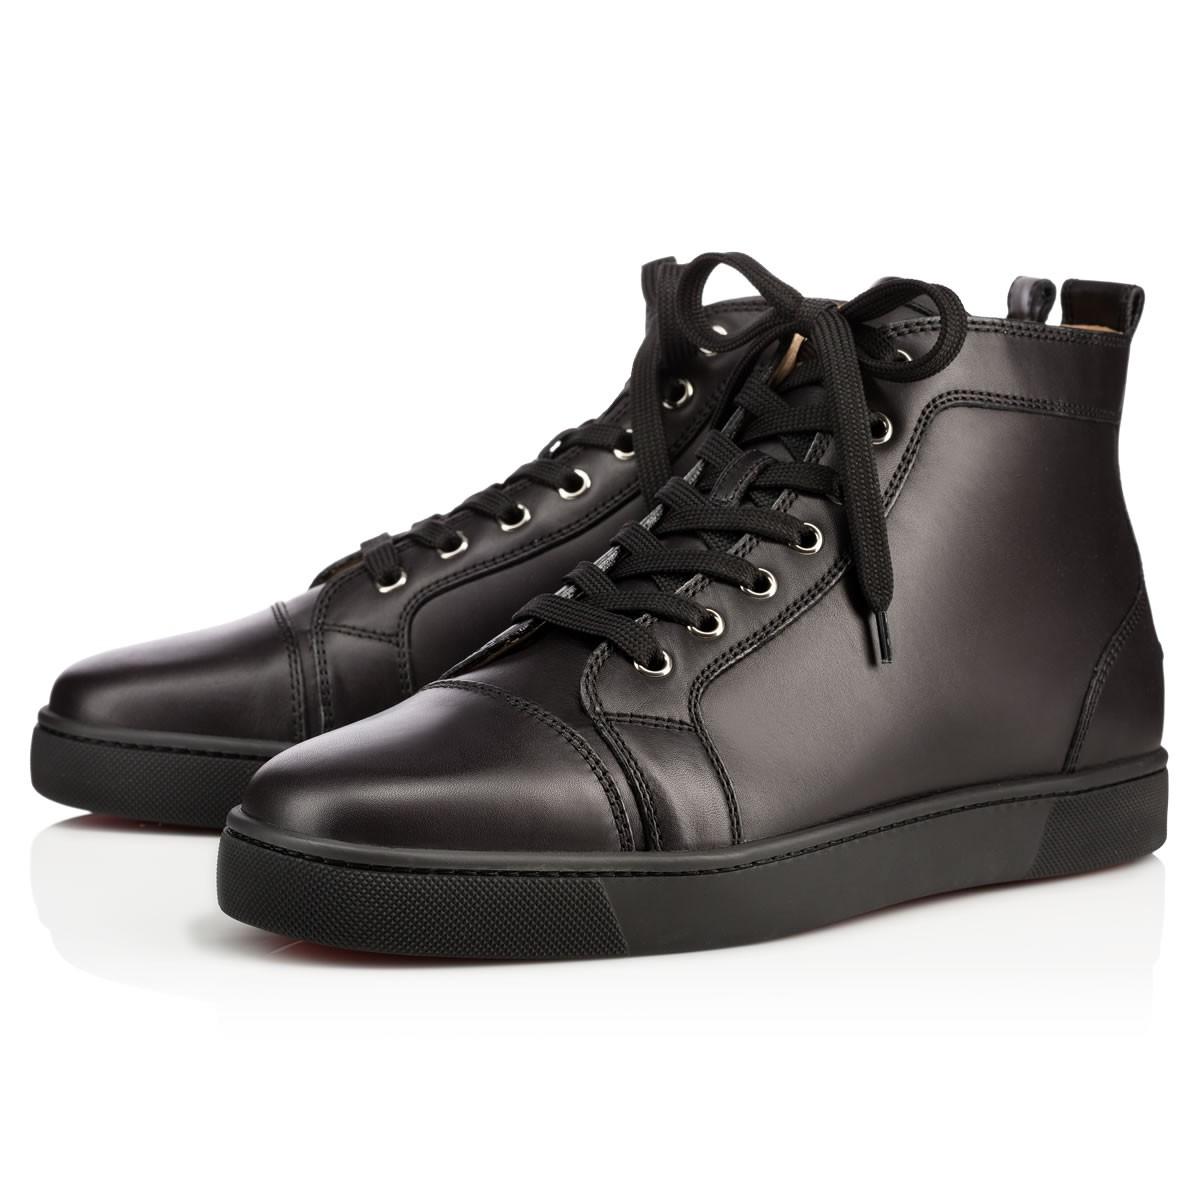 Men Shoes - Christian Louboutin